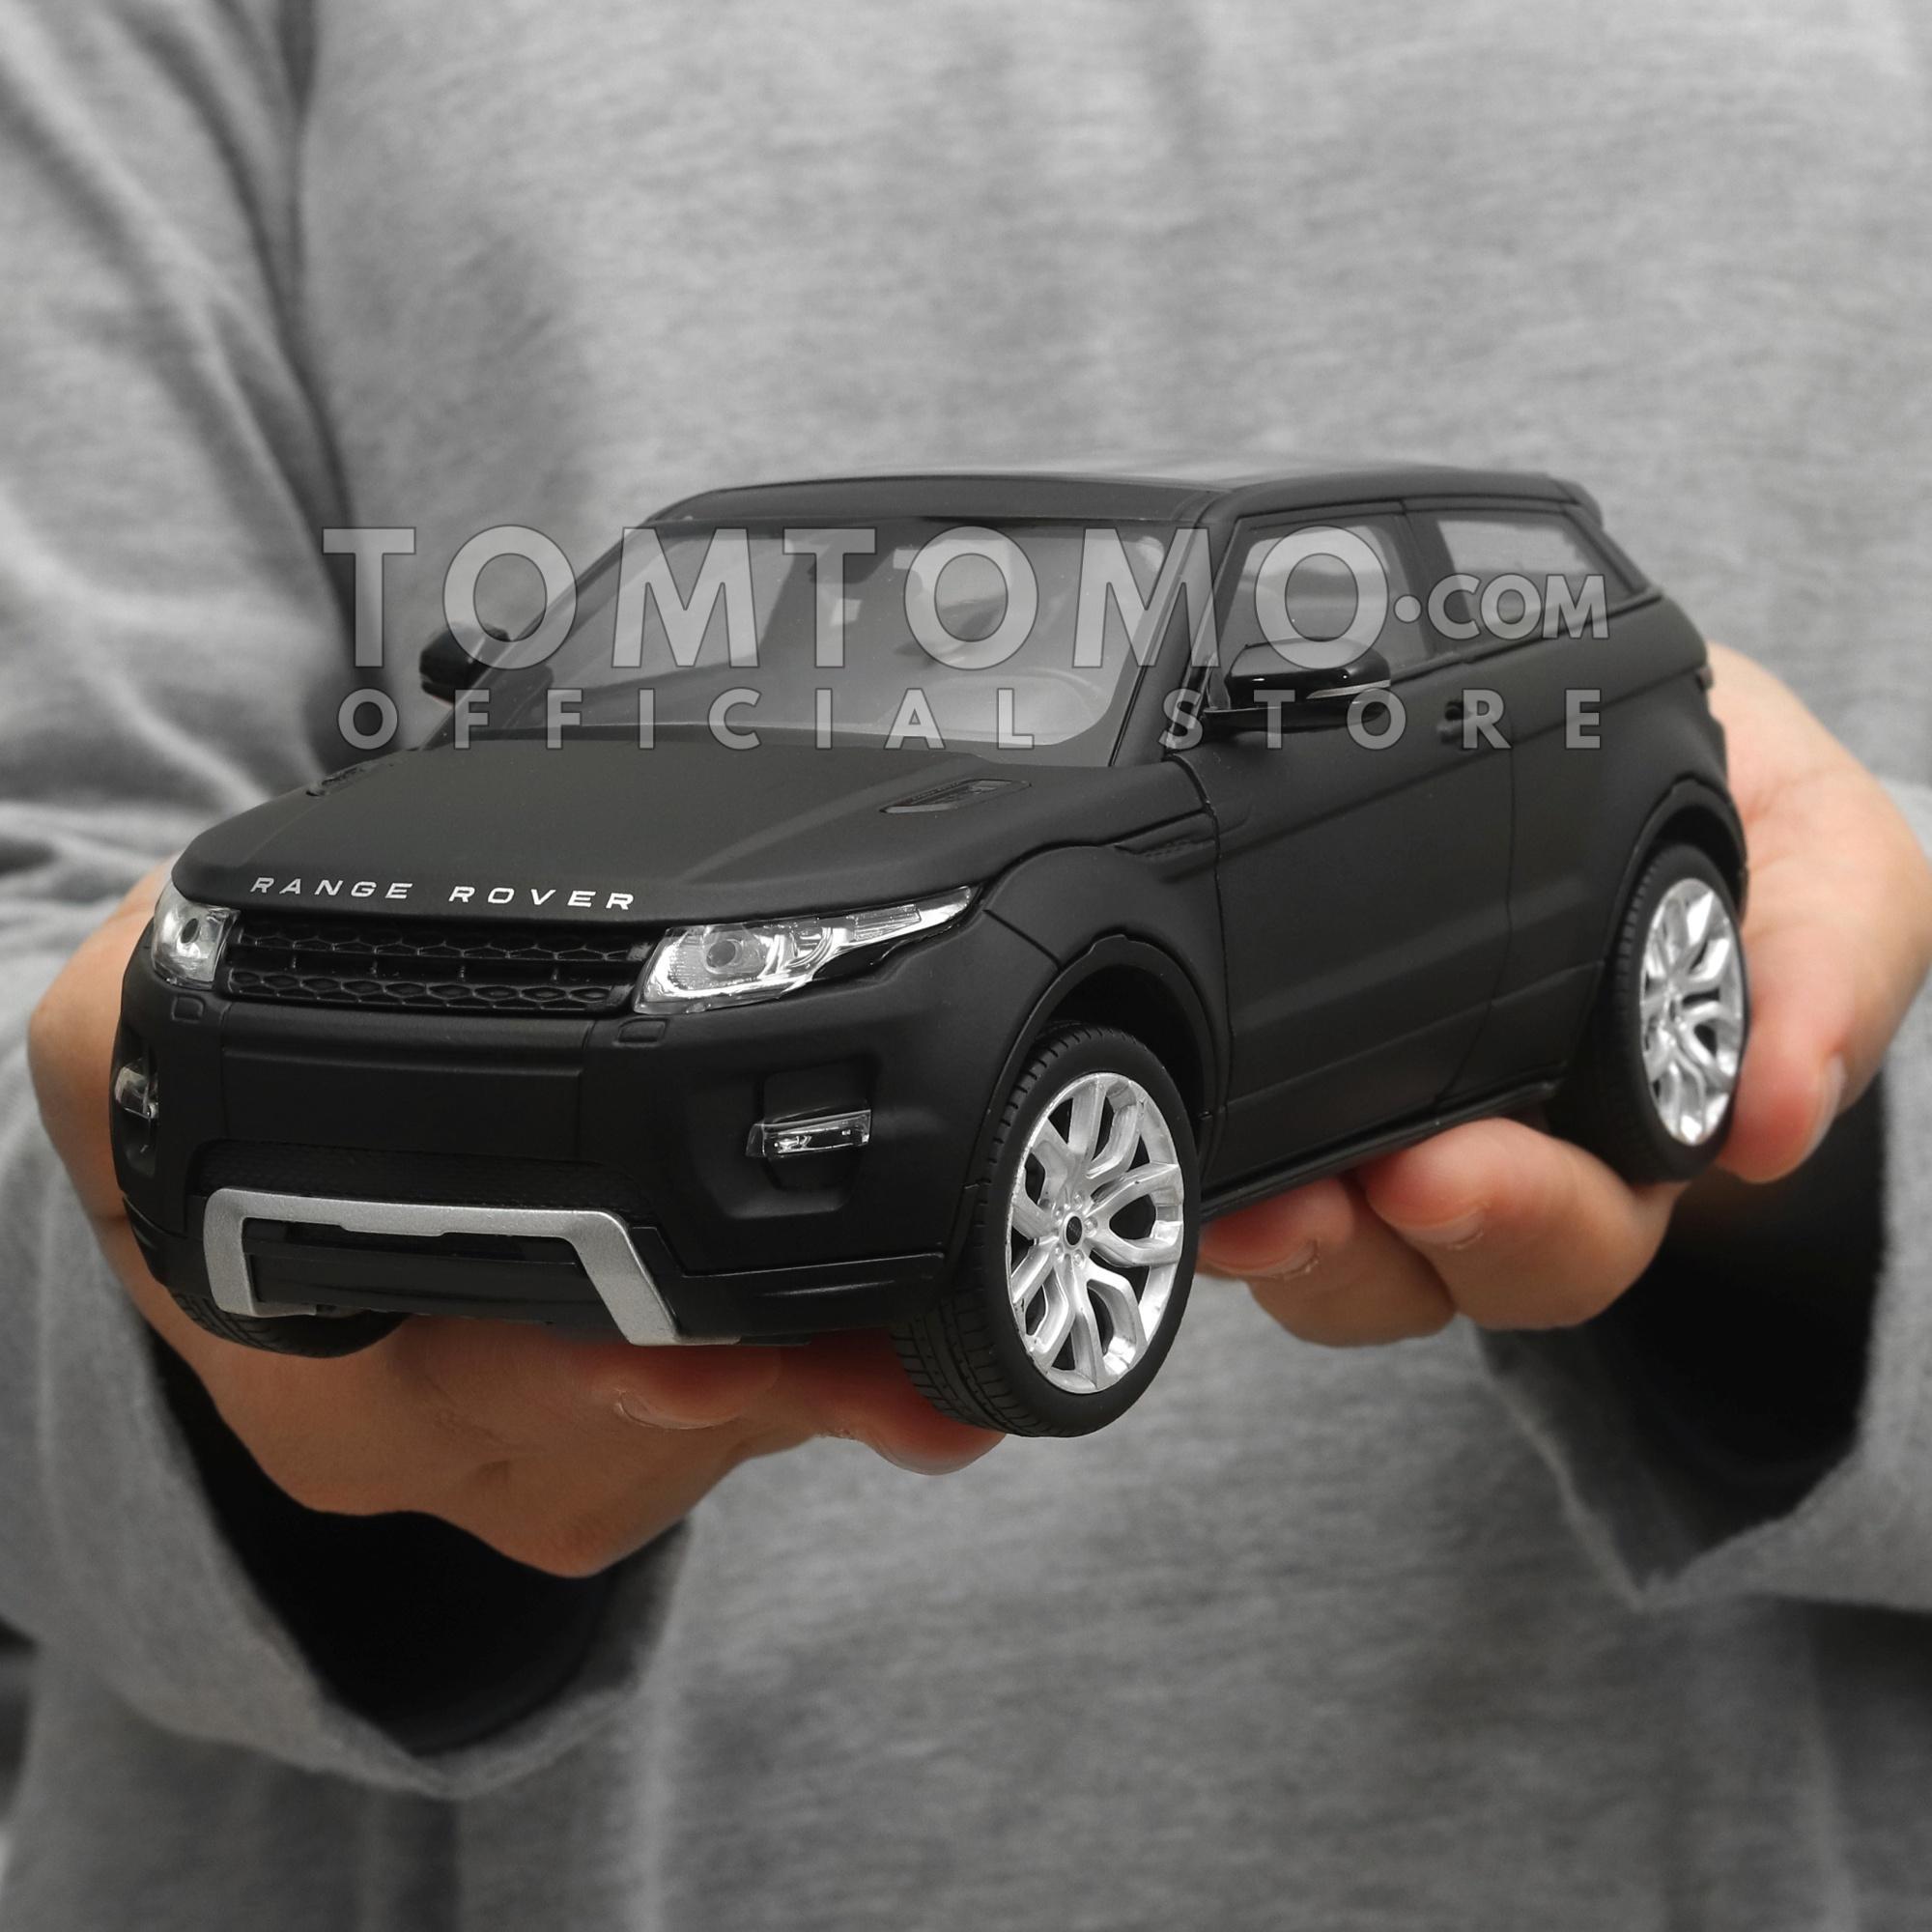 Land Range Rover Evoque Tomtomo Diecast Miniatur Mobil Mobilan SUV Jip Jeep Kado Ultah Mainan Anak Cowok Laki Aksesoris Dashboard